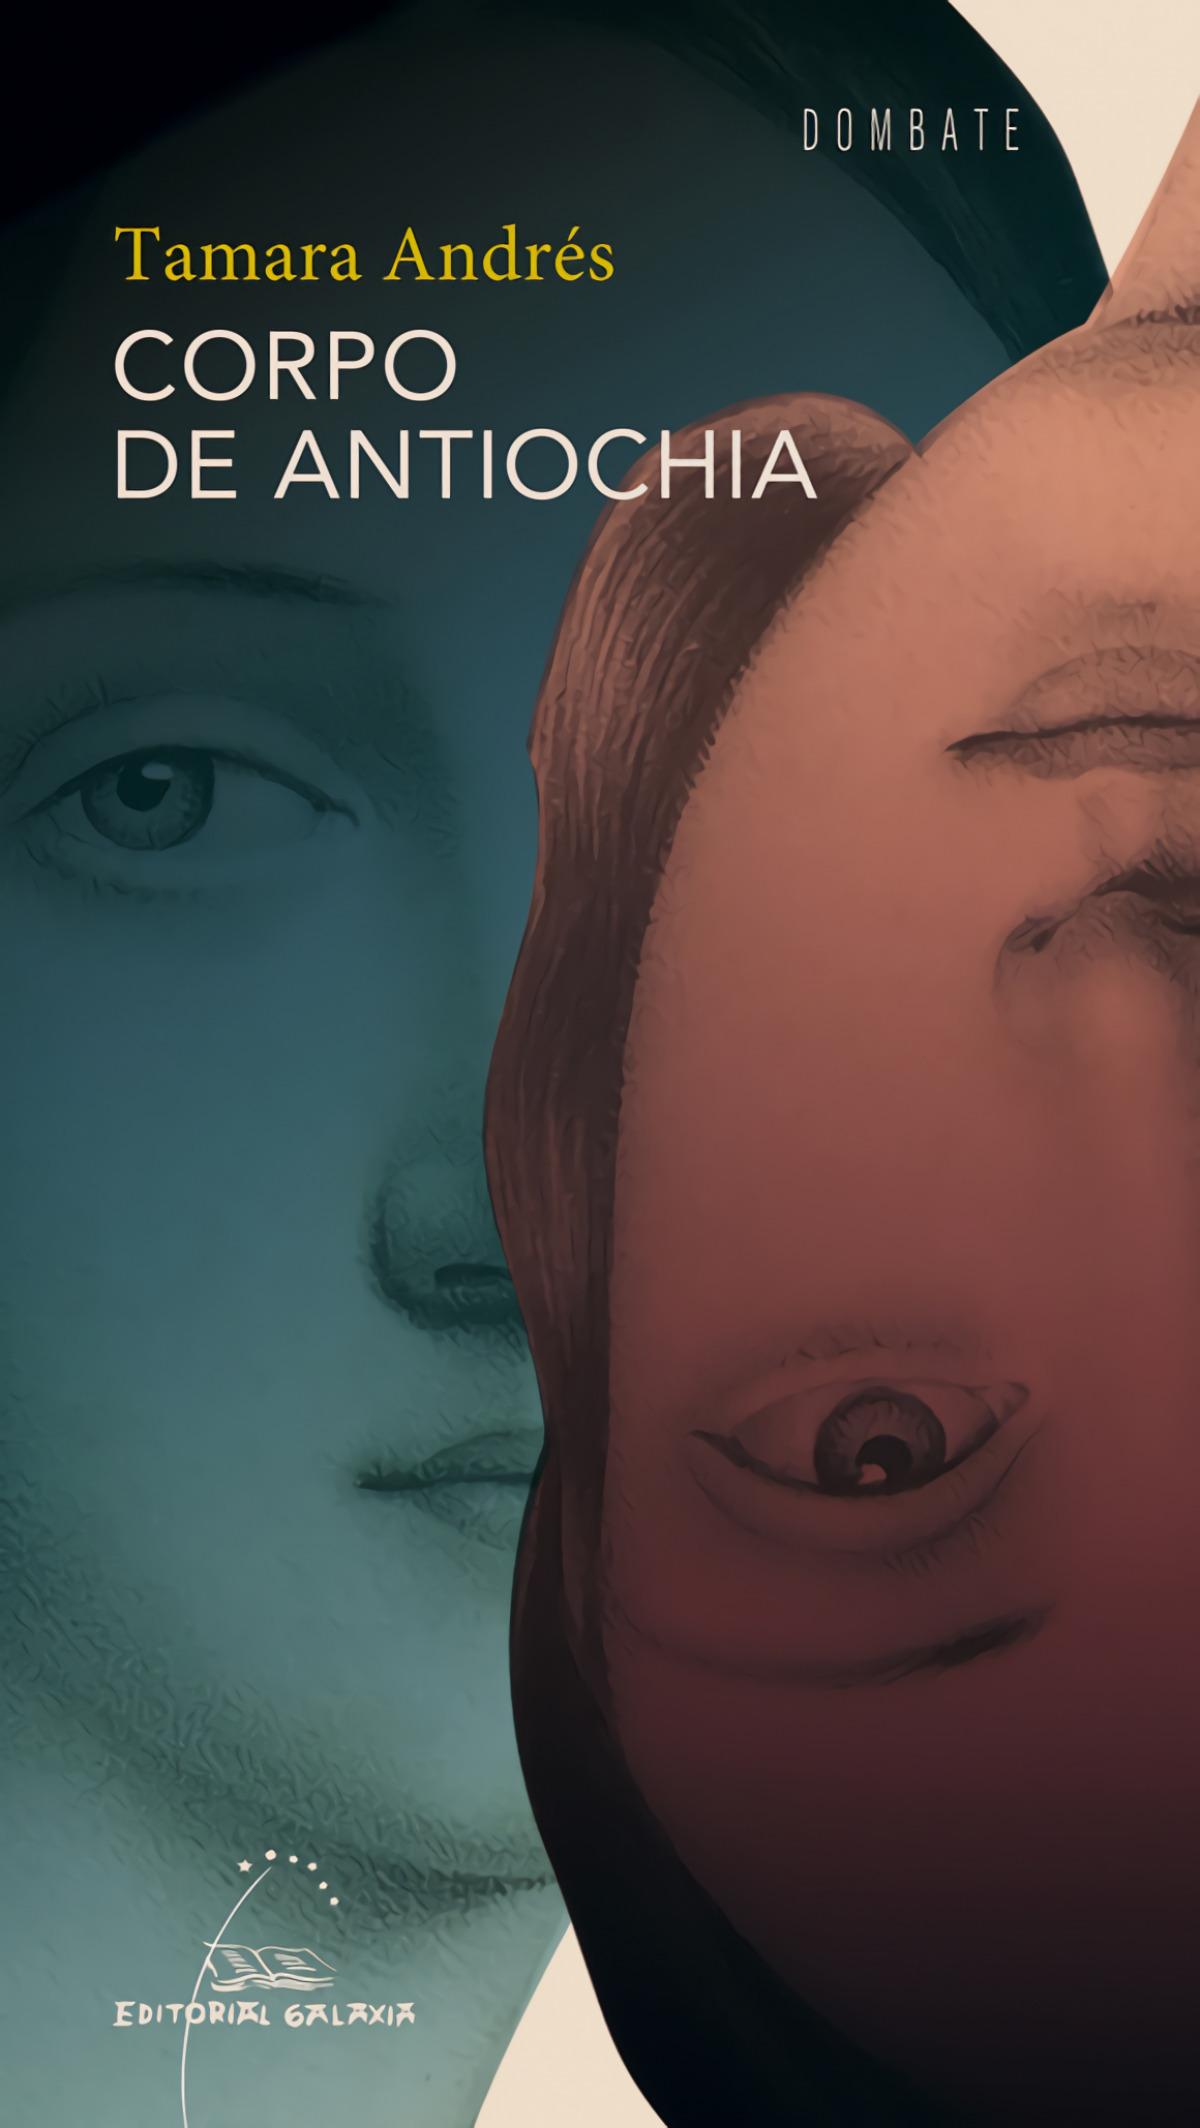 CORPO DE ANTIOCHIA 9788491510765